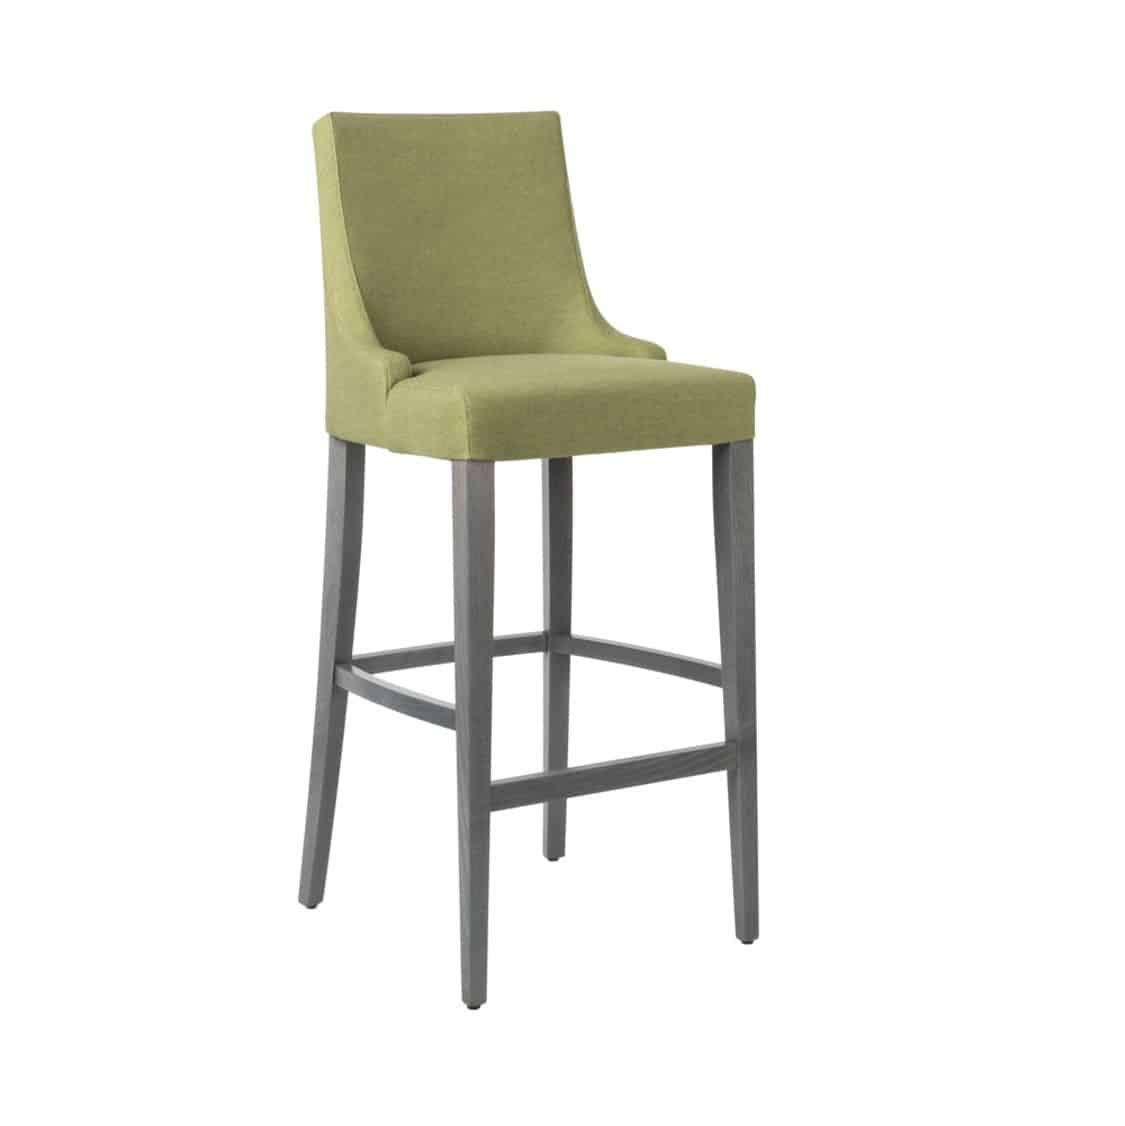 Nancy Bar Stool SG01 DeFrae Contract Furniture Base 10 High Back